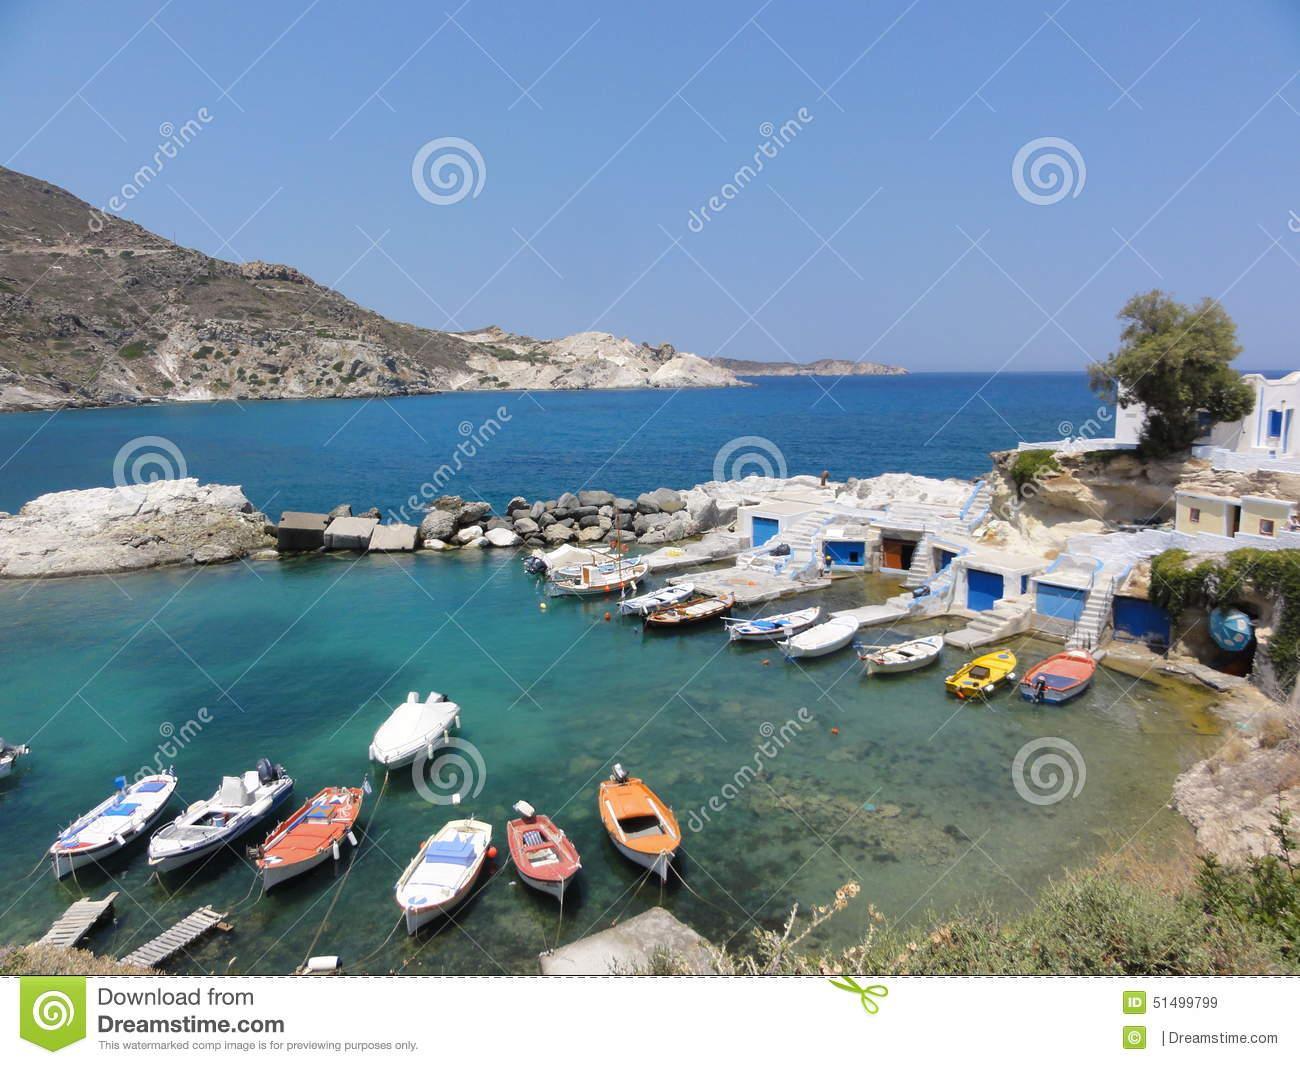 GREECE MILOS ISLAND FISHERMAN VILLAGE BOATS SUMMER IN EMERALD.